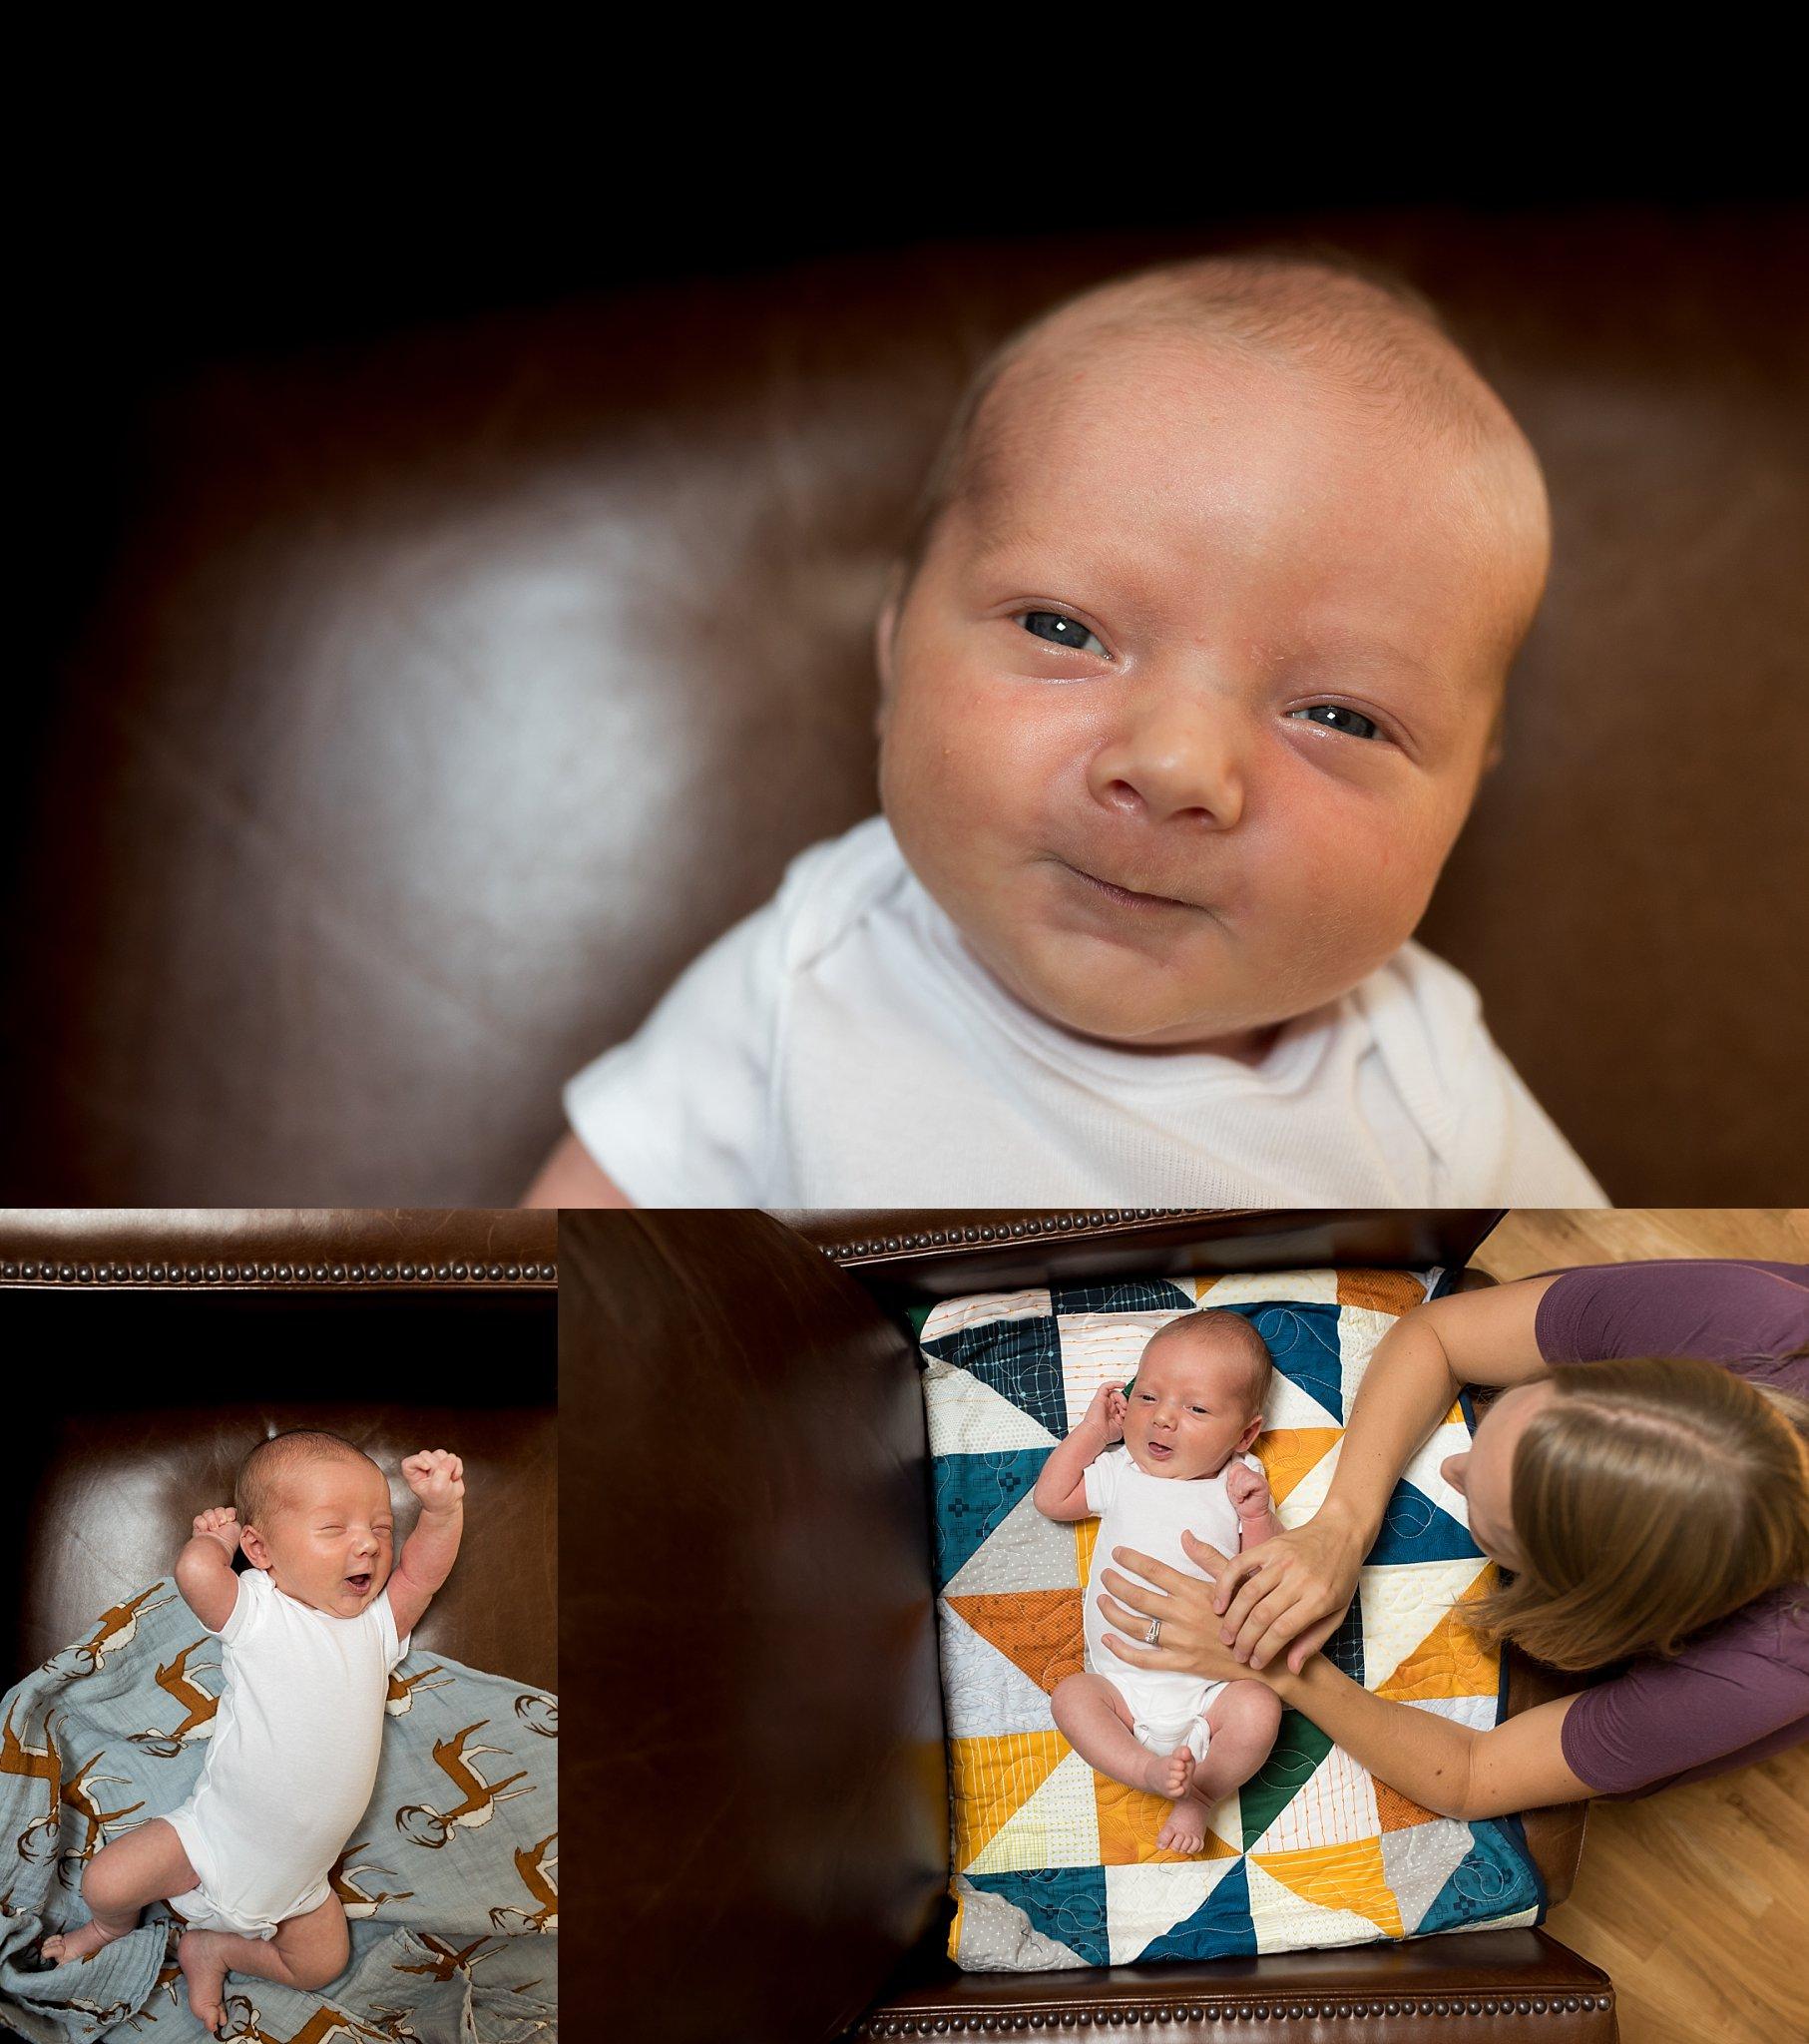 atlanta-family-photographers-decatur-newborn-photography (2).jpg